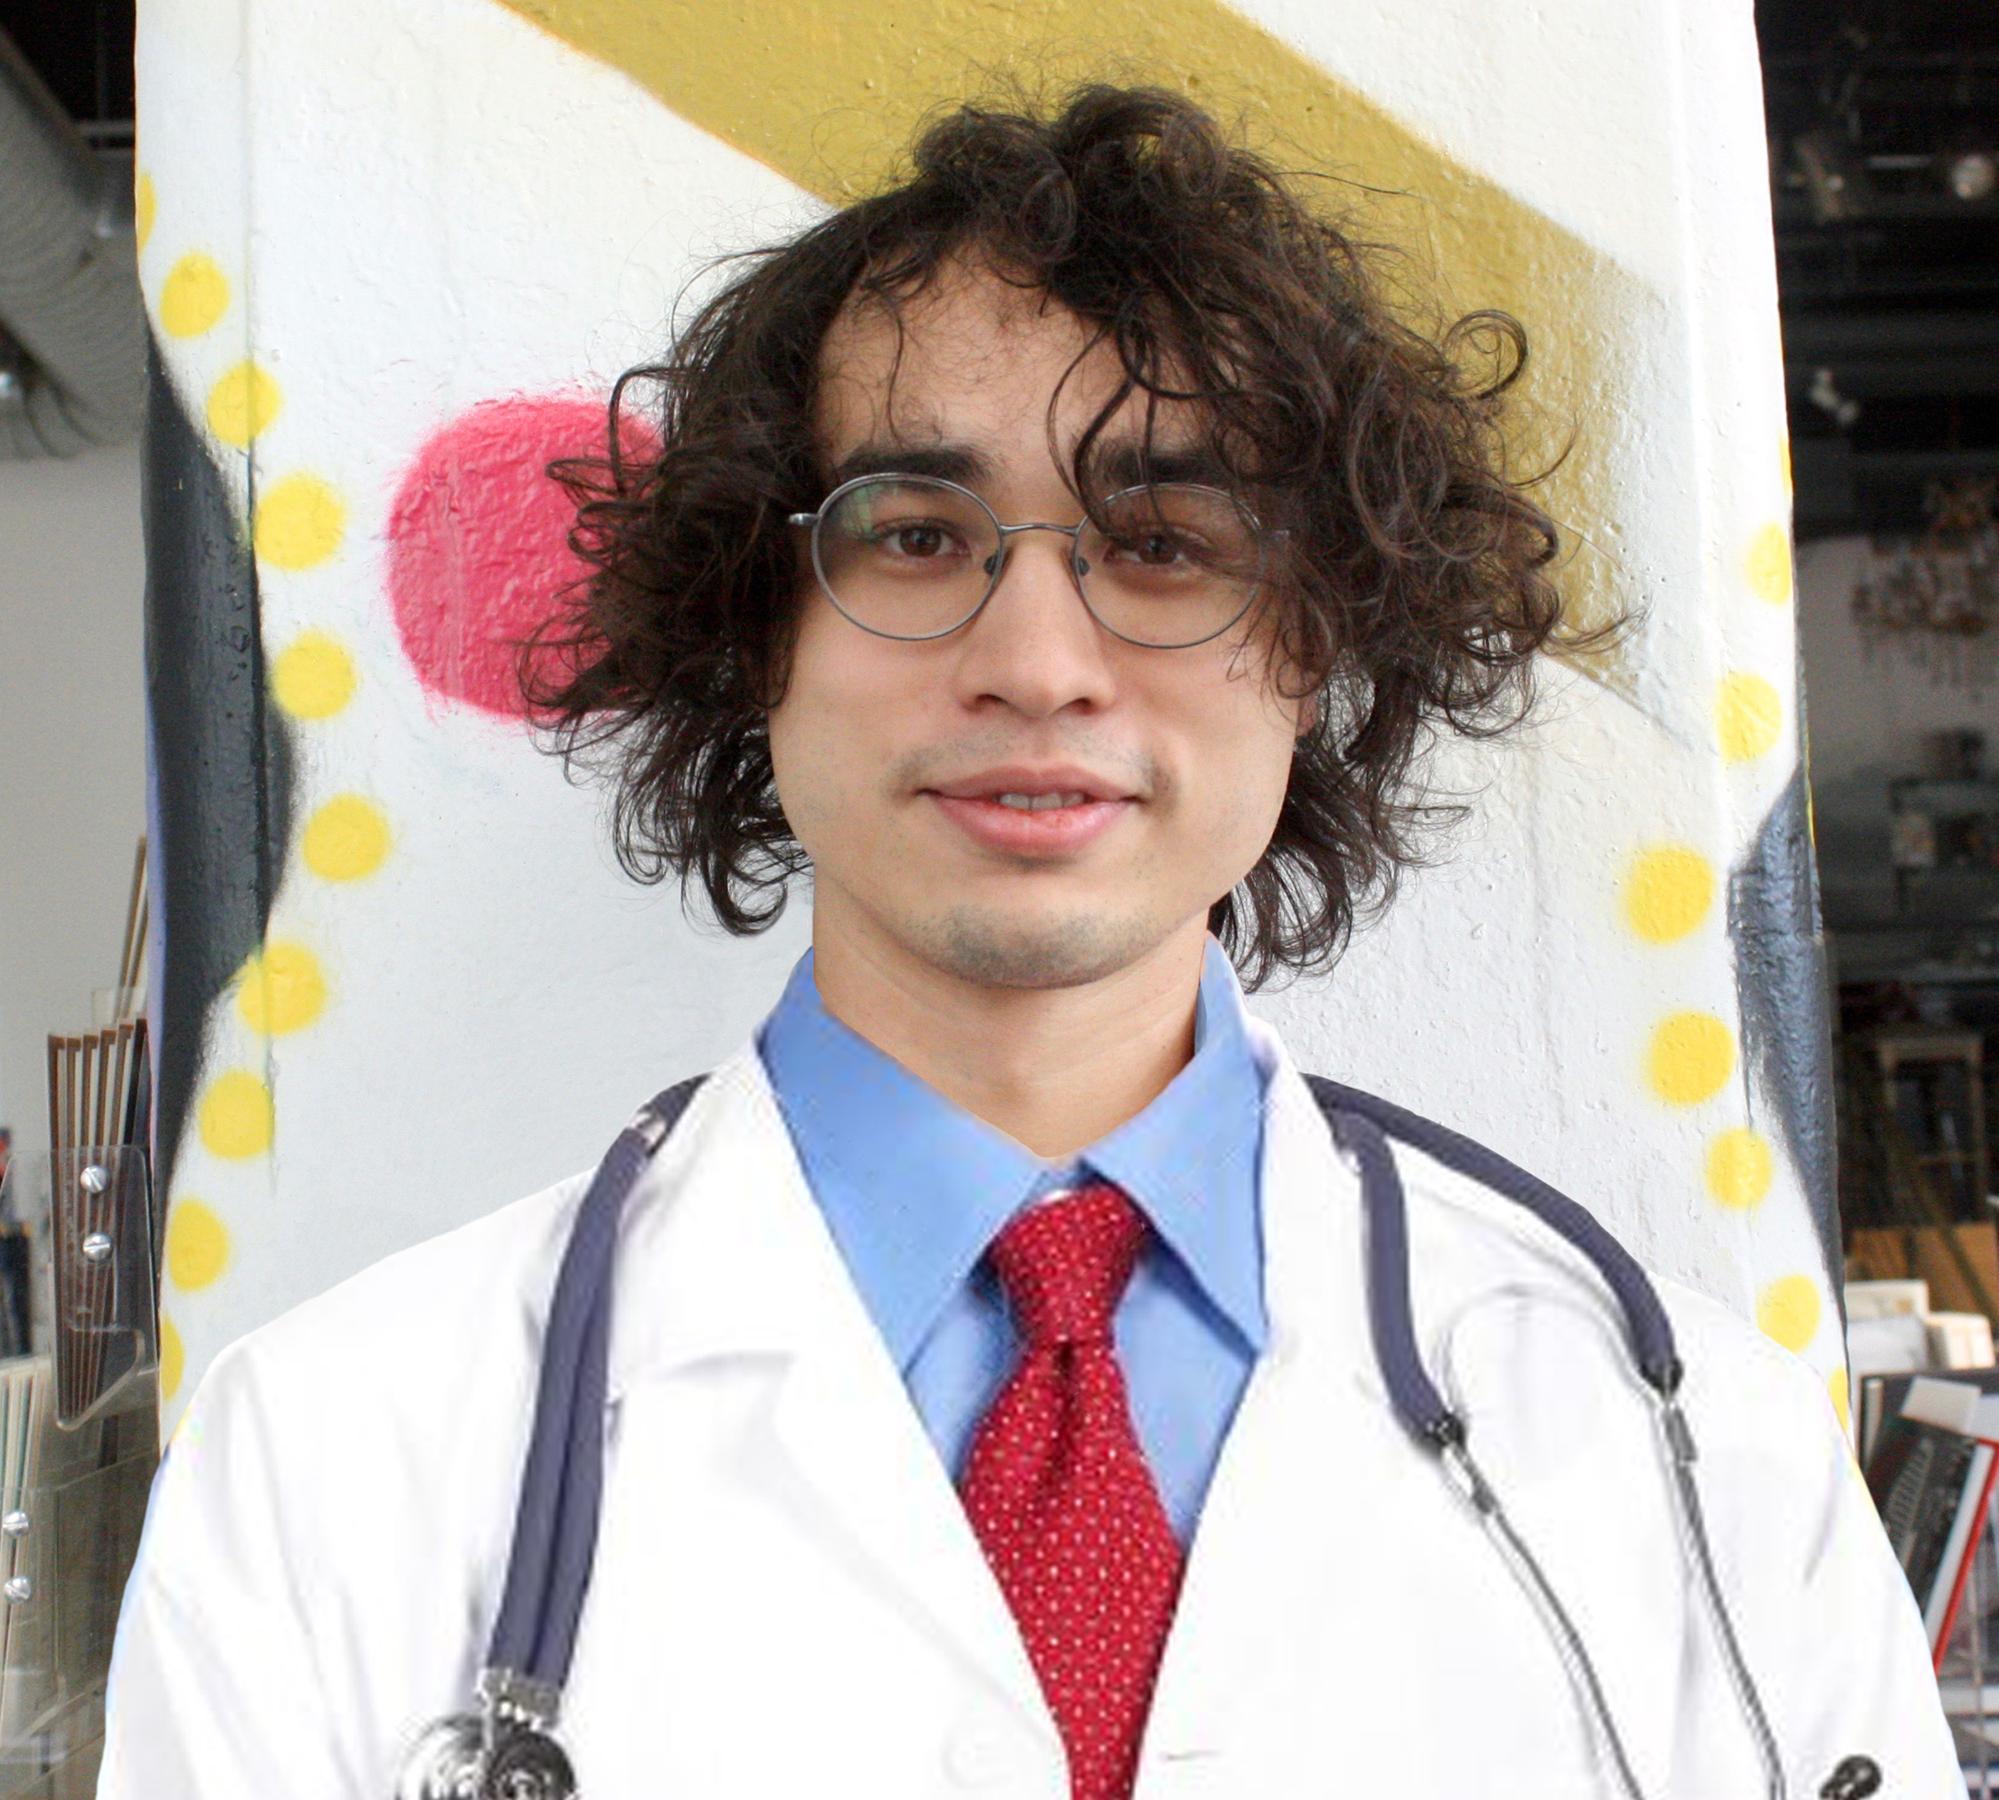 Chris doctor